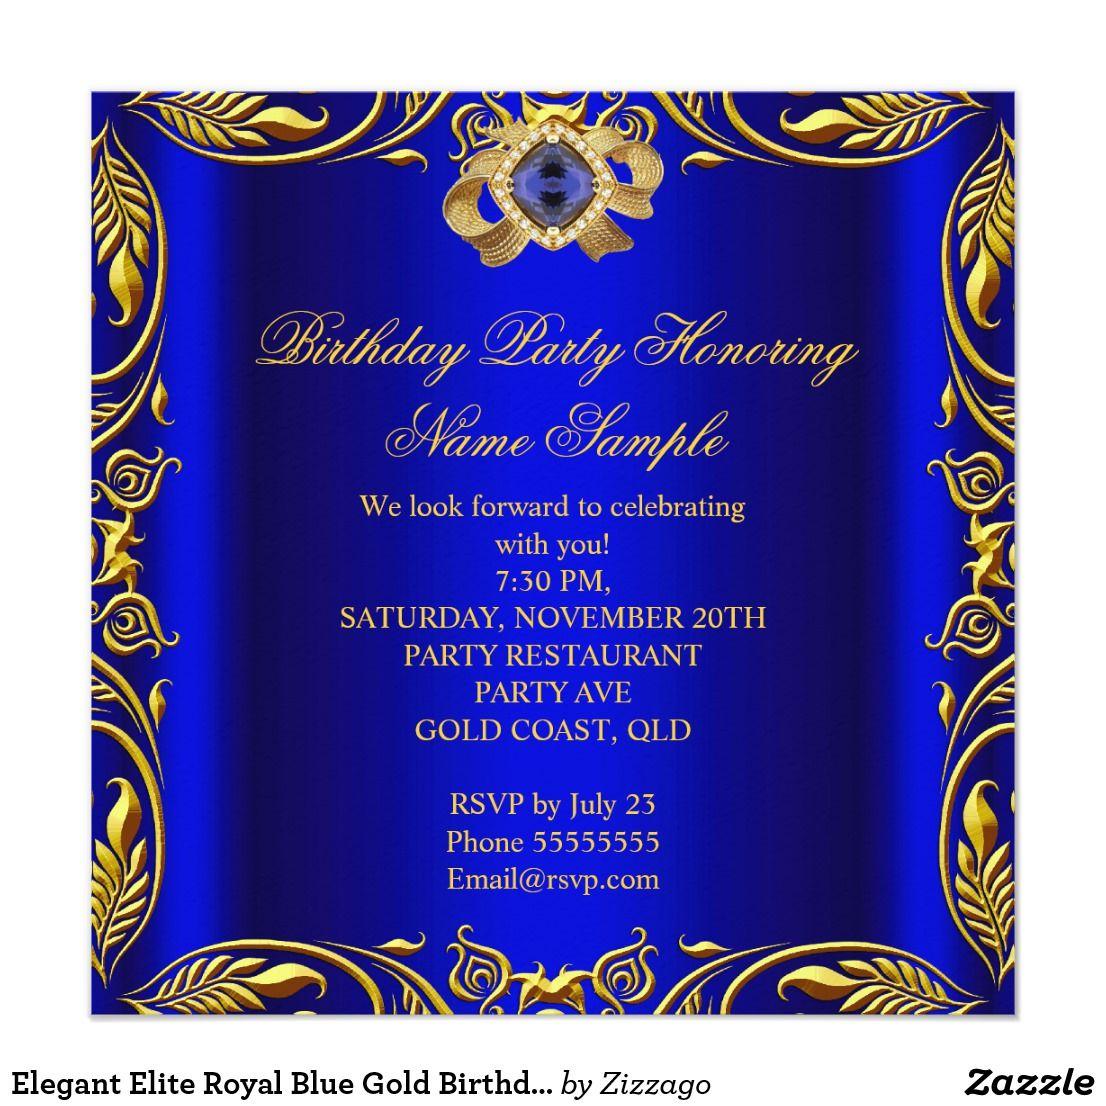 Elegant Elite Royal Blue Gold Birthday Party 2 Invitation | Zazzle.com |  Royal blue and gold, Purple and gold wedding, Gold birthday party